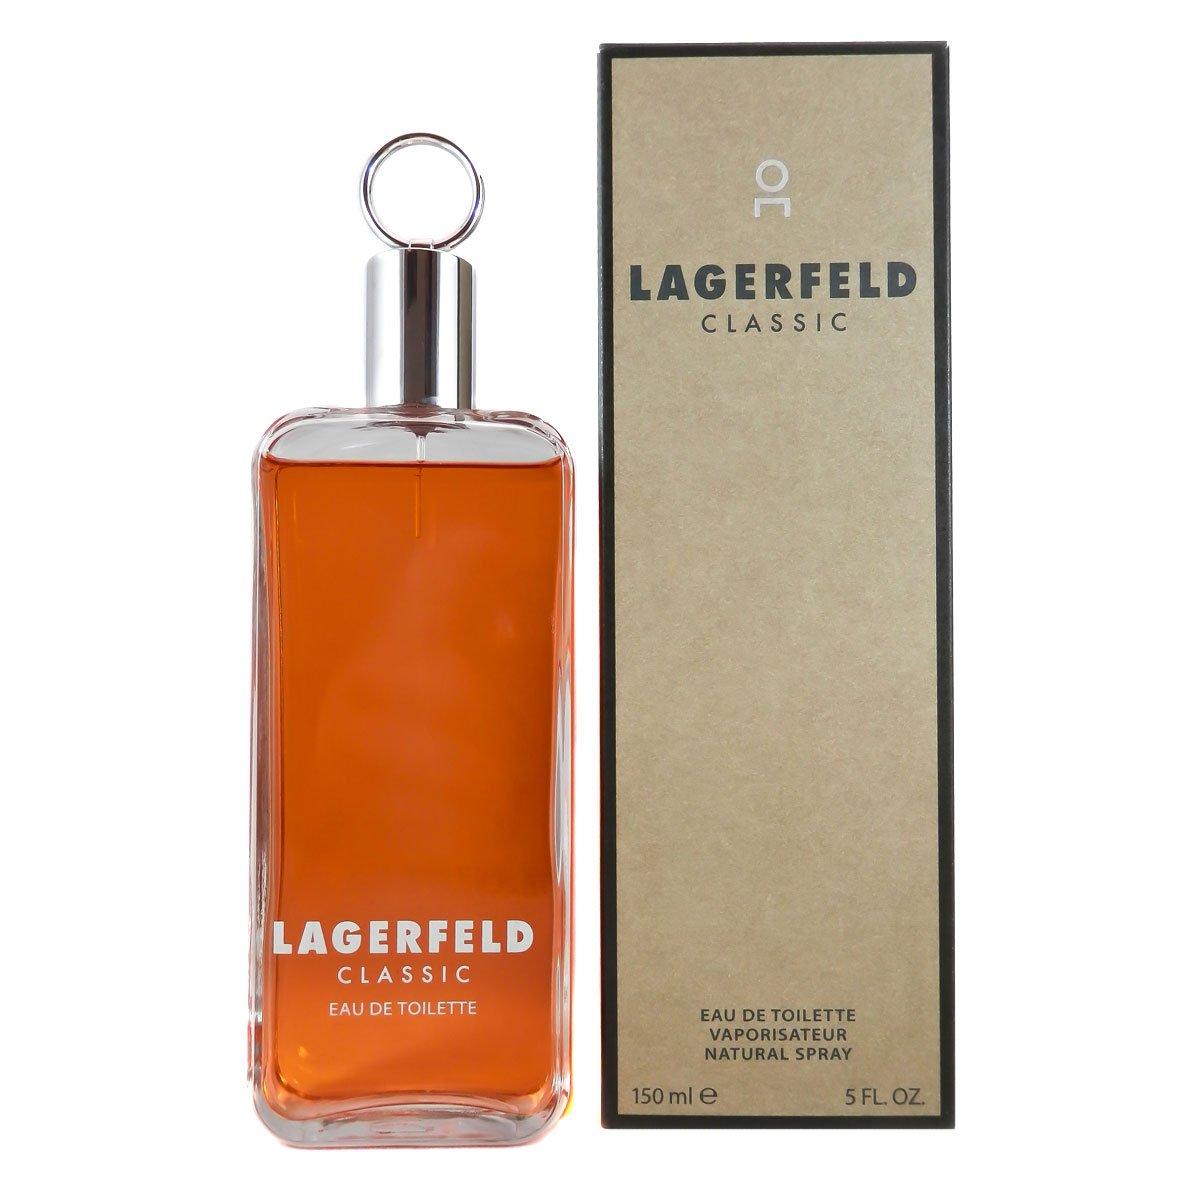 Amazon.com : Karl Lagerfeld Classic for Men Eau de Toilette Spray, 5 Ounce : Beauty